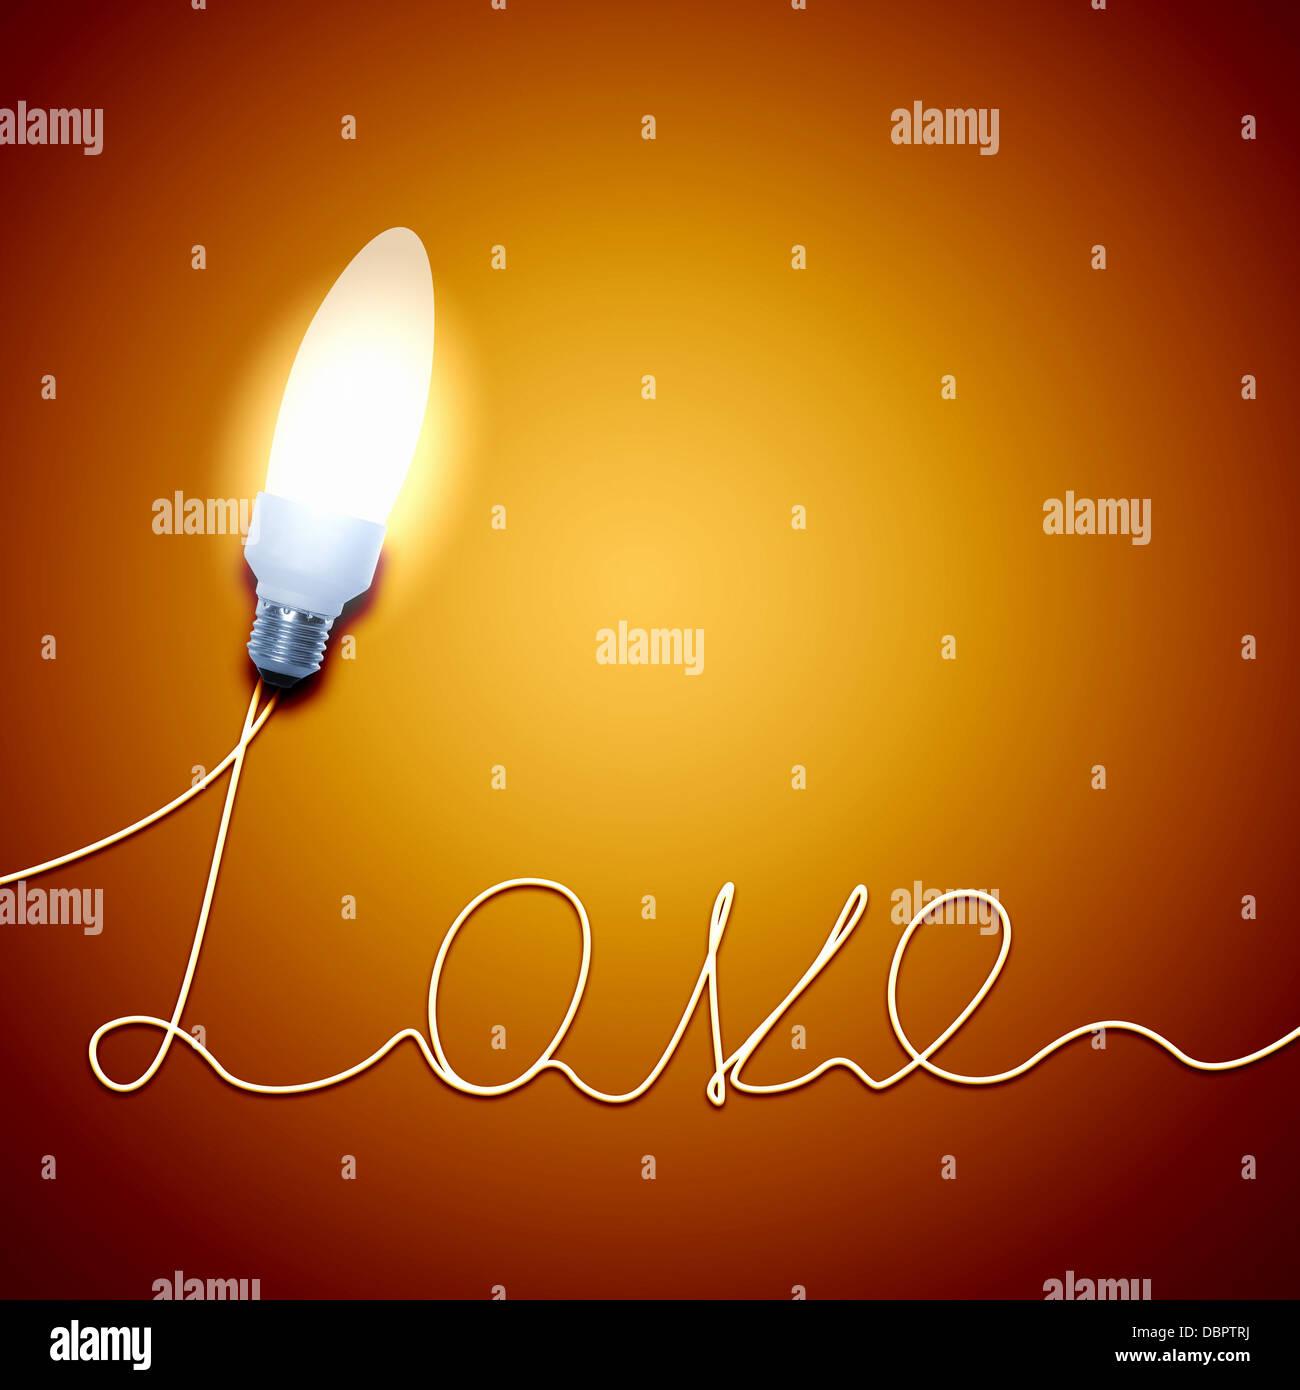 Bombilla de luz de amor Imagen De Stock